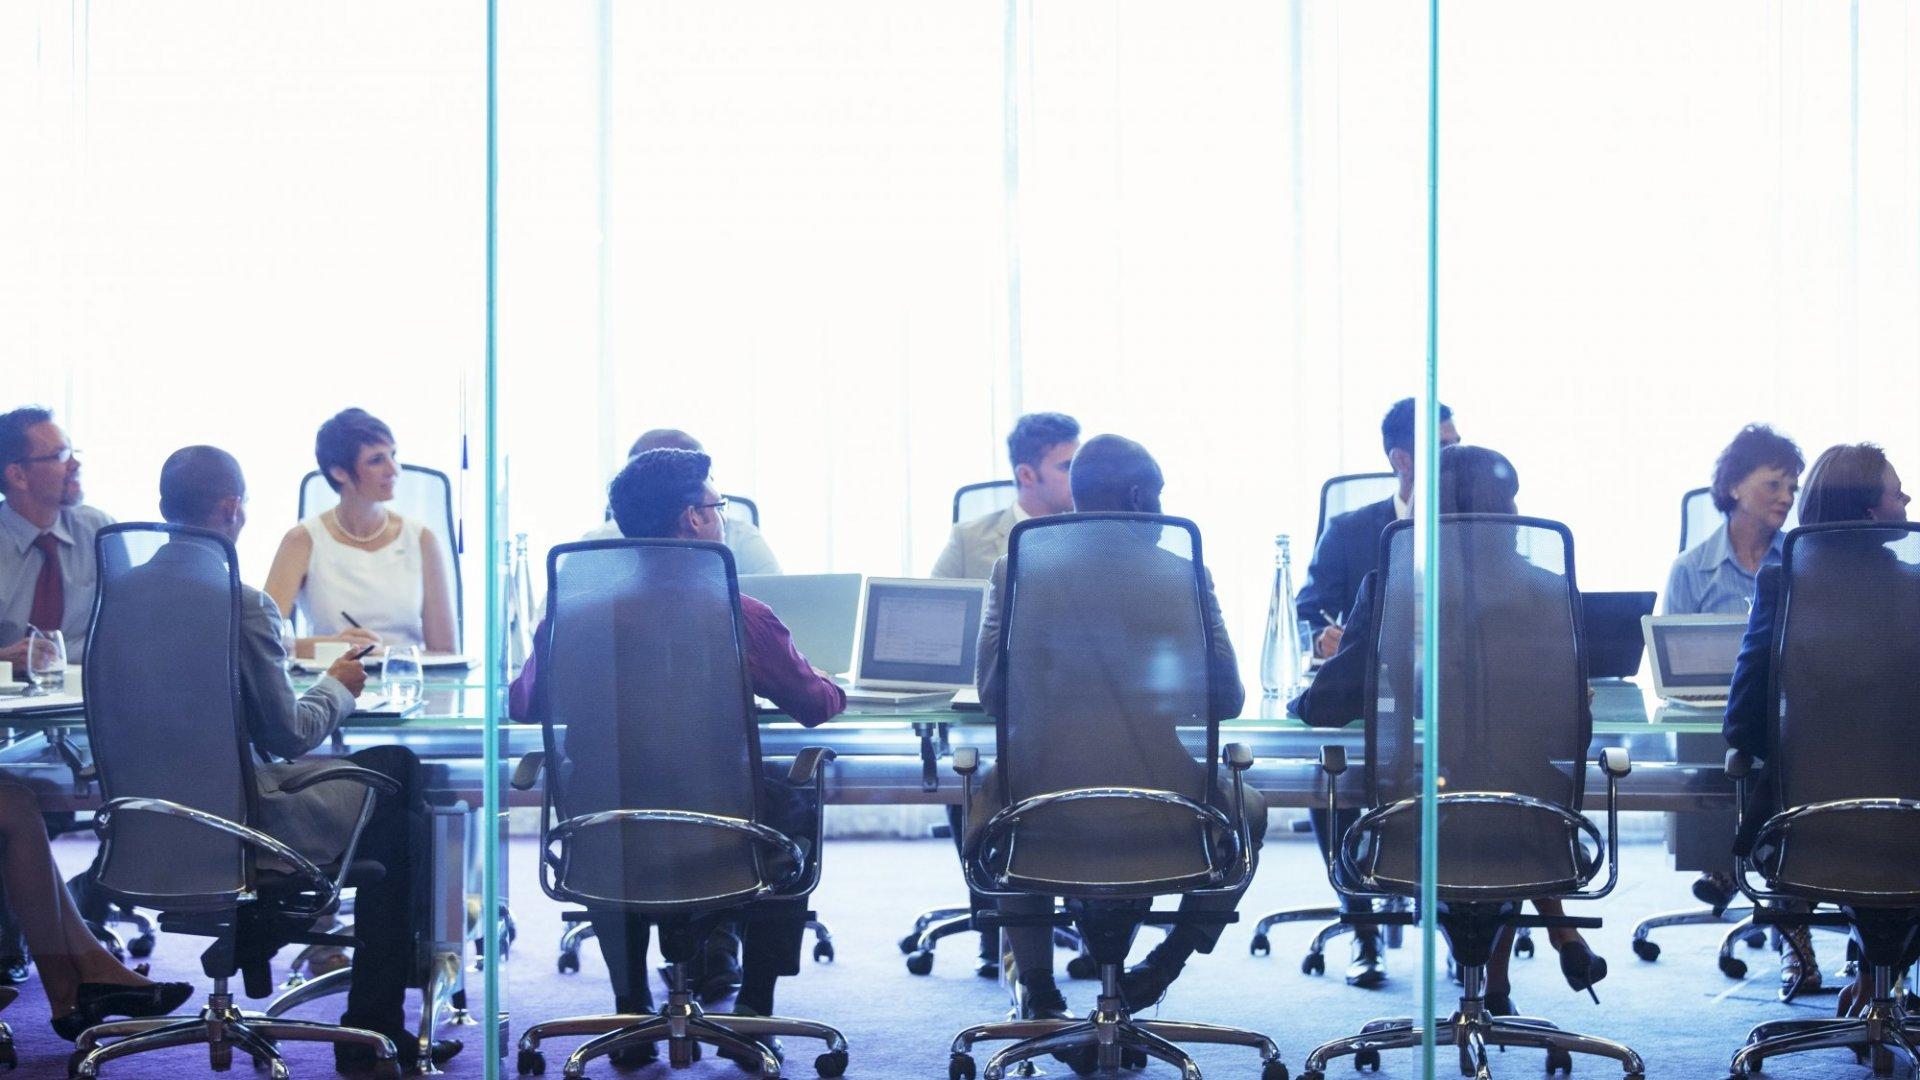 Report: Women Still Underrepresented on Tech Company Boards